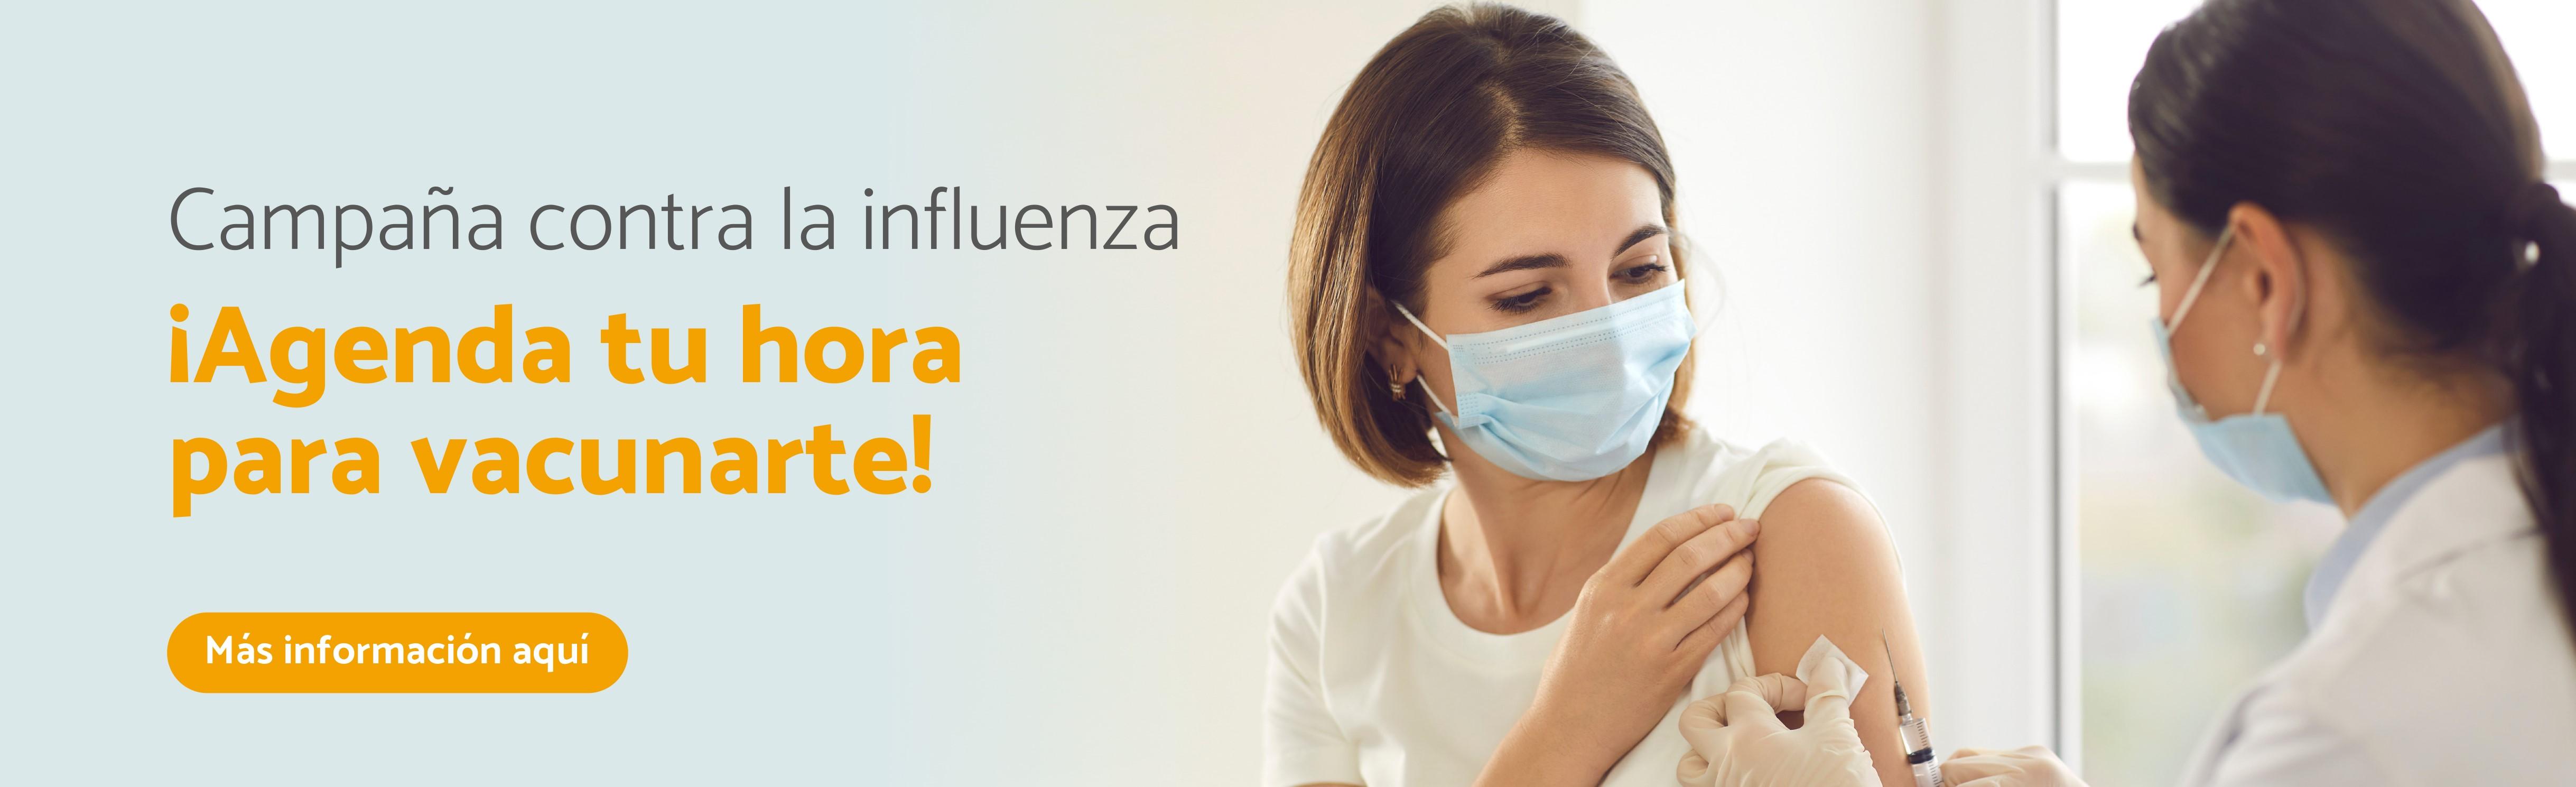 campana_vacuna_influenza_banner_desktop2